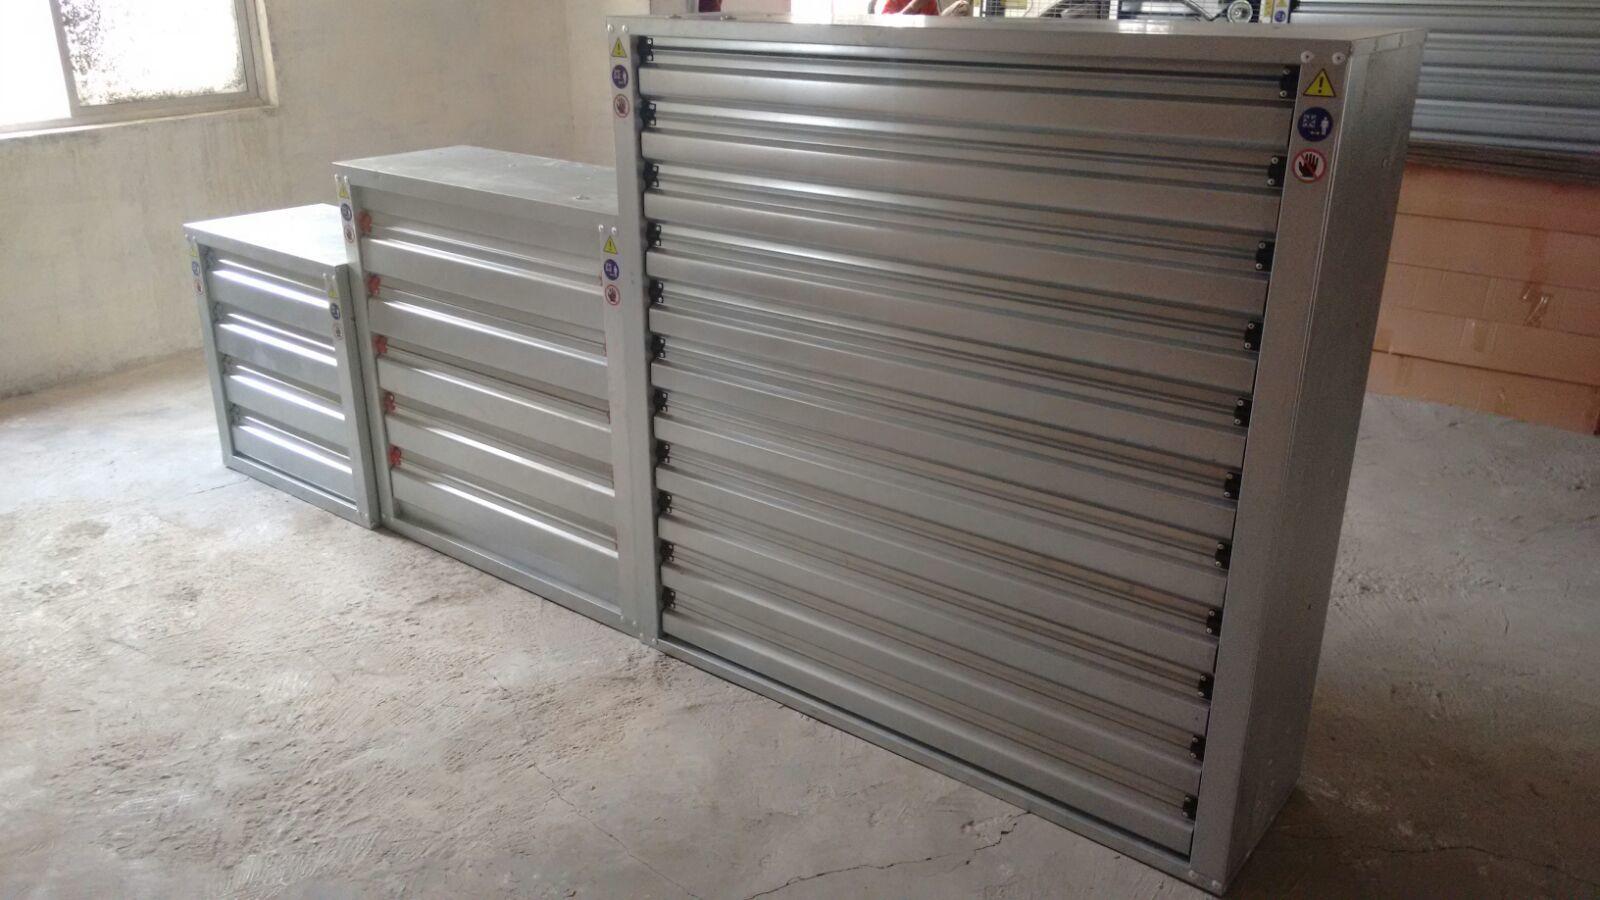 Negative Ventilation Exhaust Box Fan